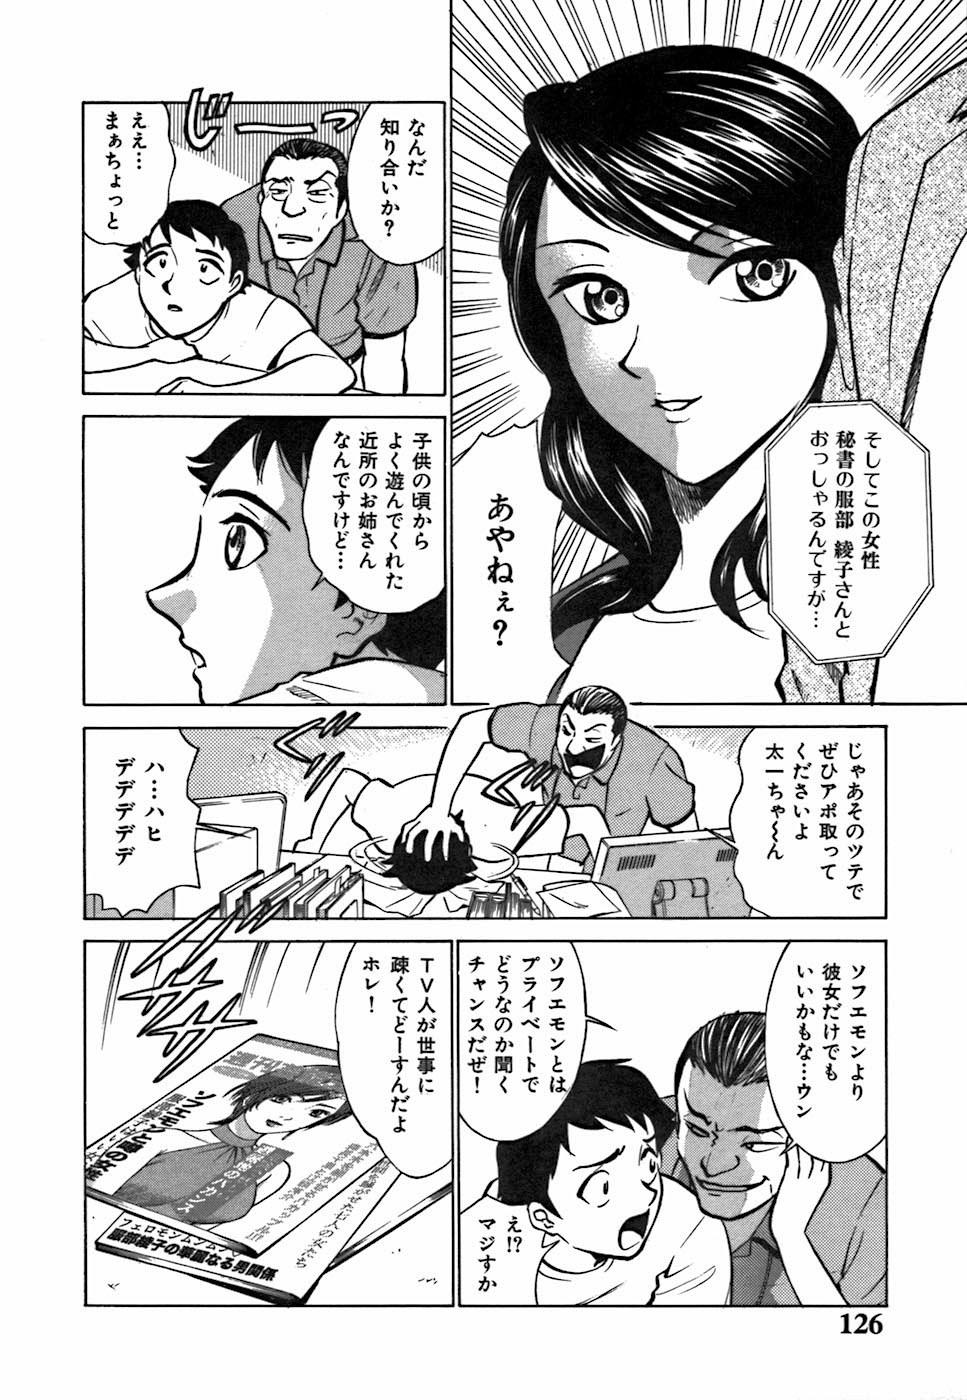 Kimi ga Nozomu Katachi | Appearance for which you hope 125